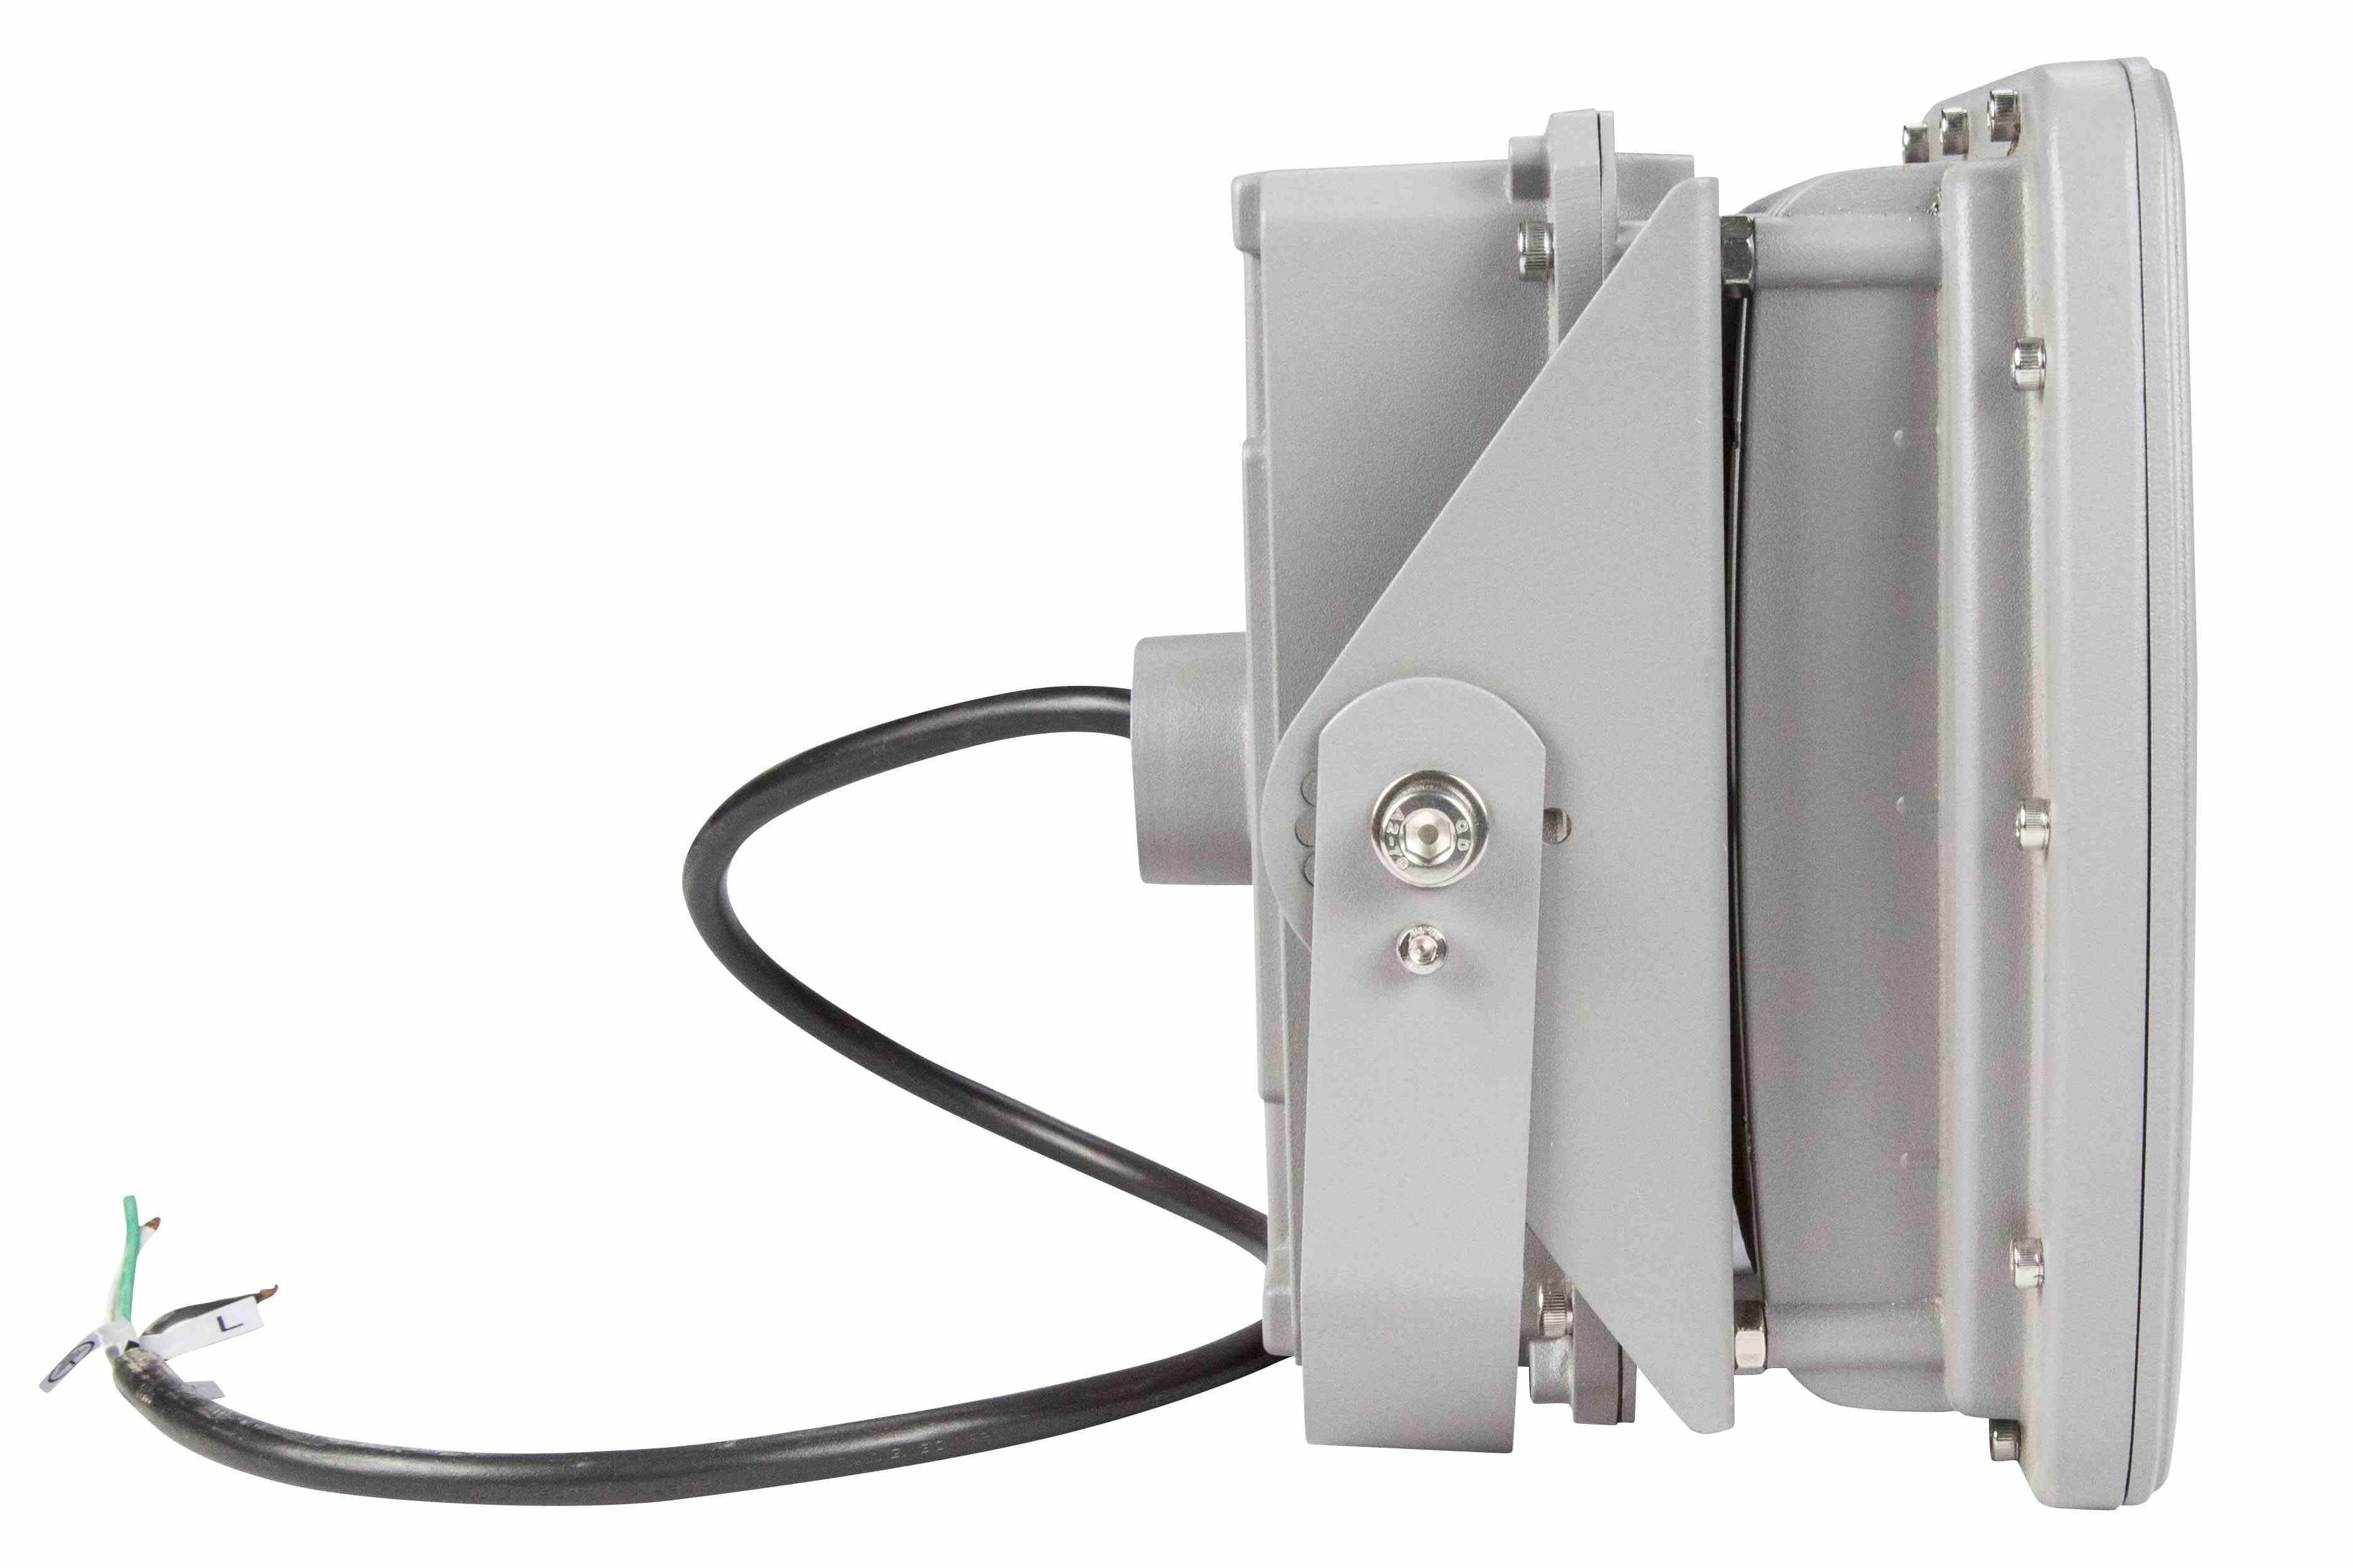 40 Watt Hazardous Locations Low Profile Led Light Fixture Class 1 Wiring 2 White Black Hi Res Image 4 Back Angle